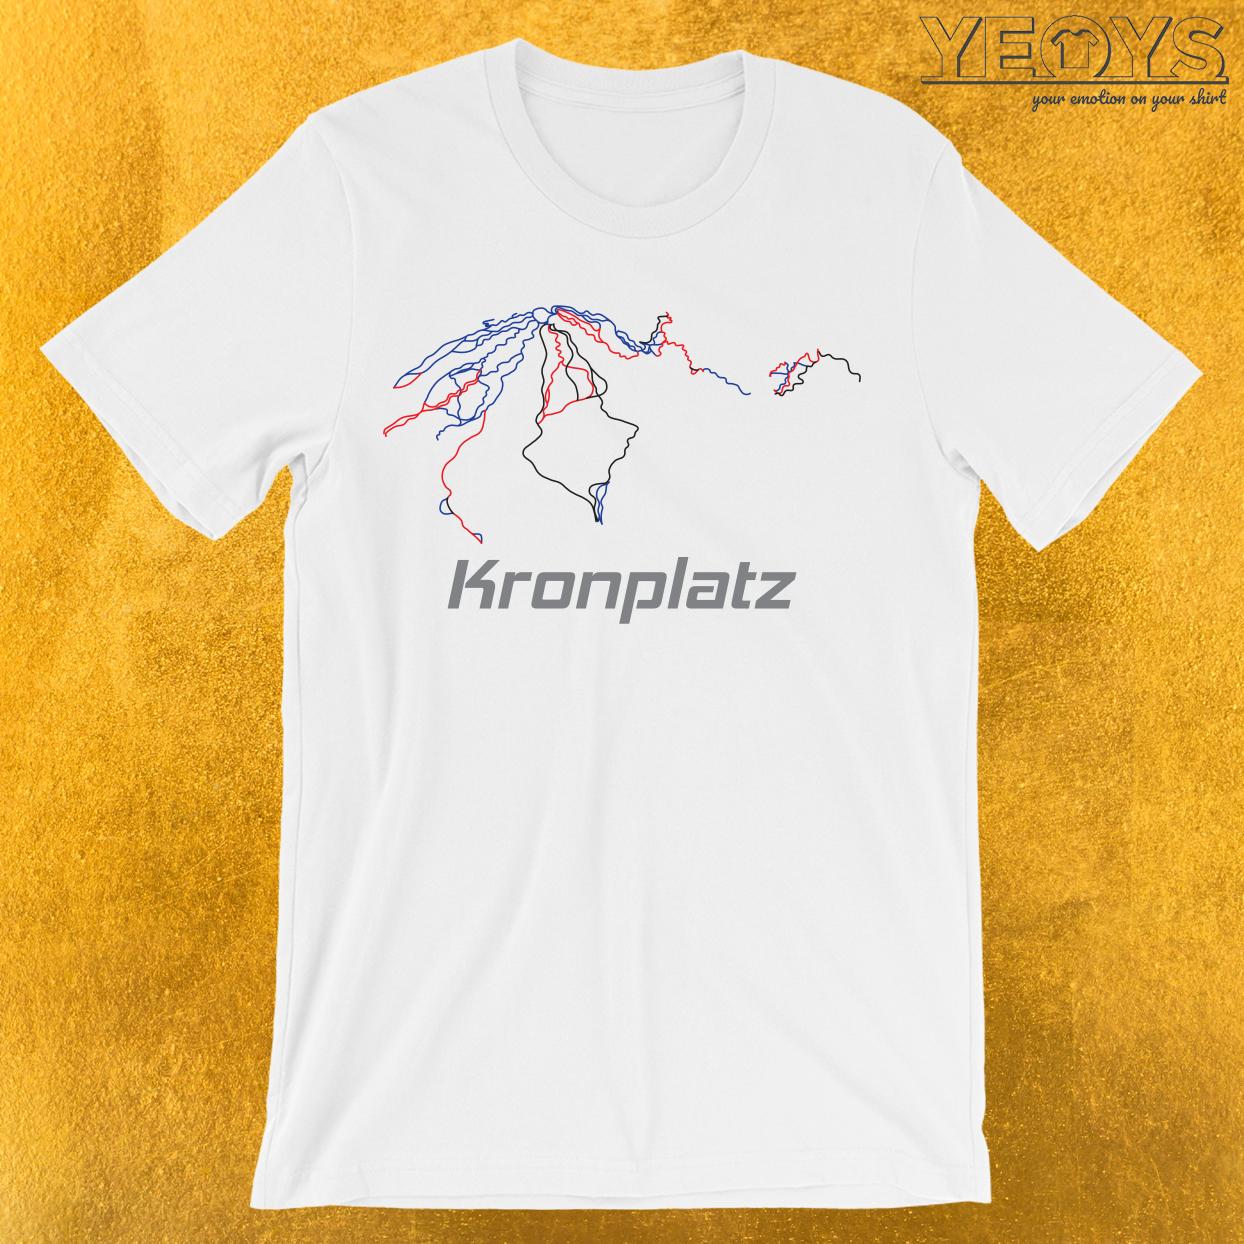 Kronplatz Südtirol Ski Piste Karte T-Shirt